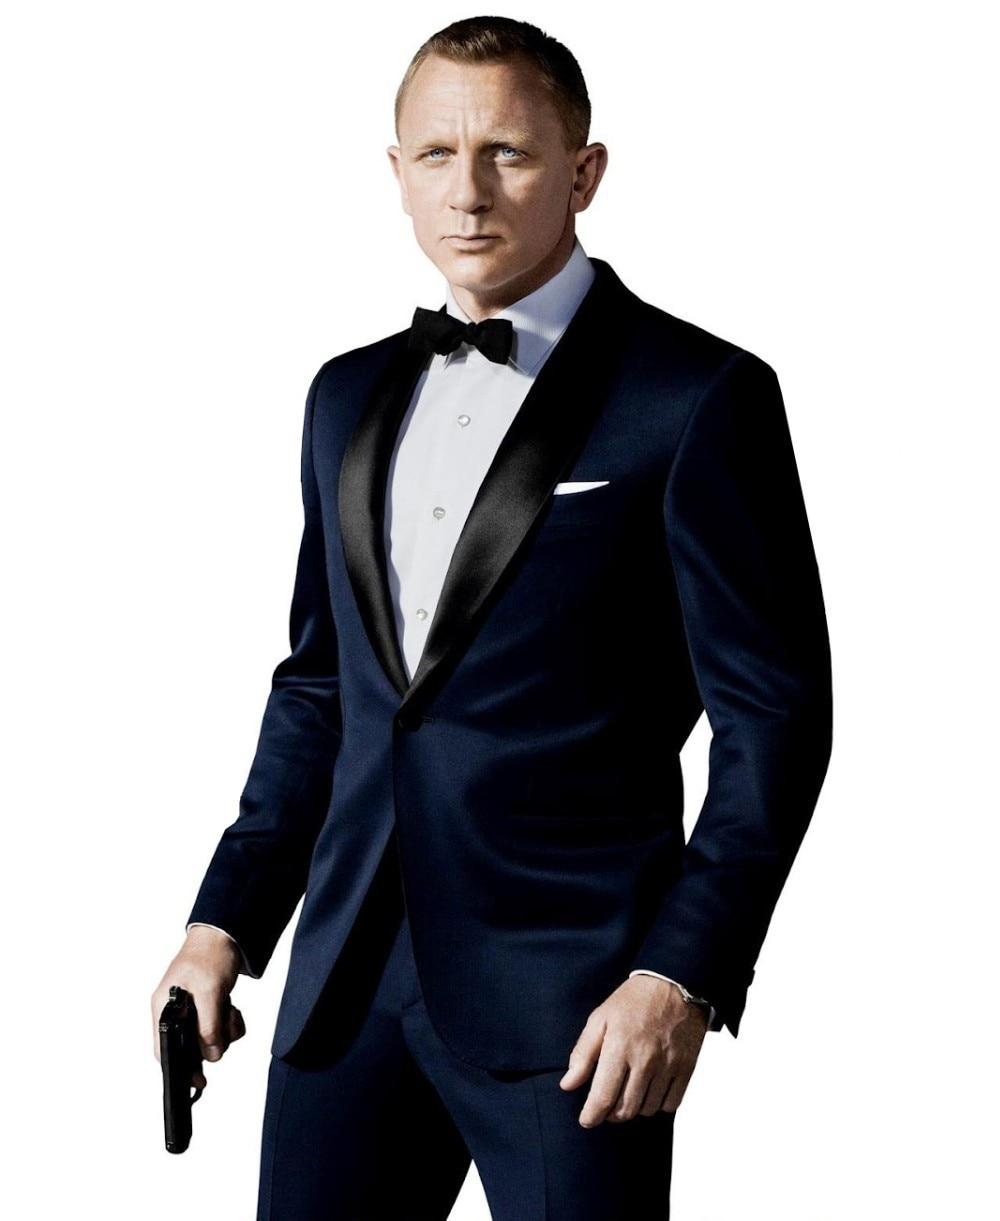 Online Shop Custom Made Dark Blue Tuxedo Inspired By Suit Worn In ...